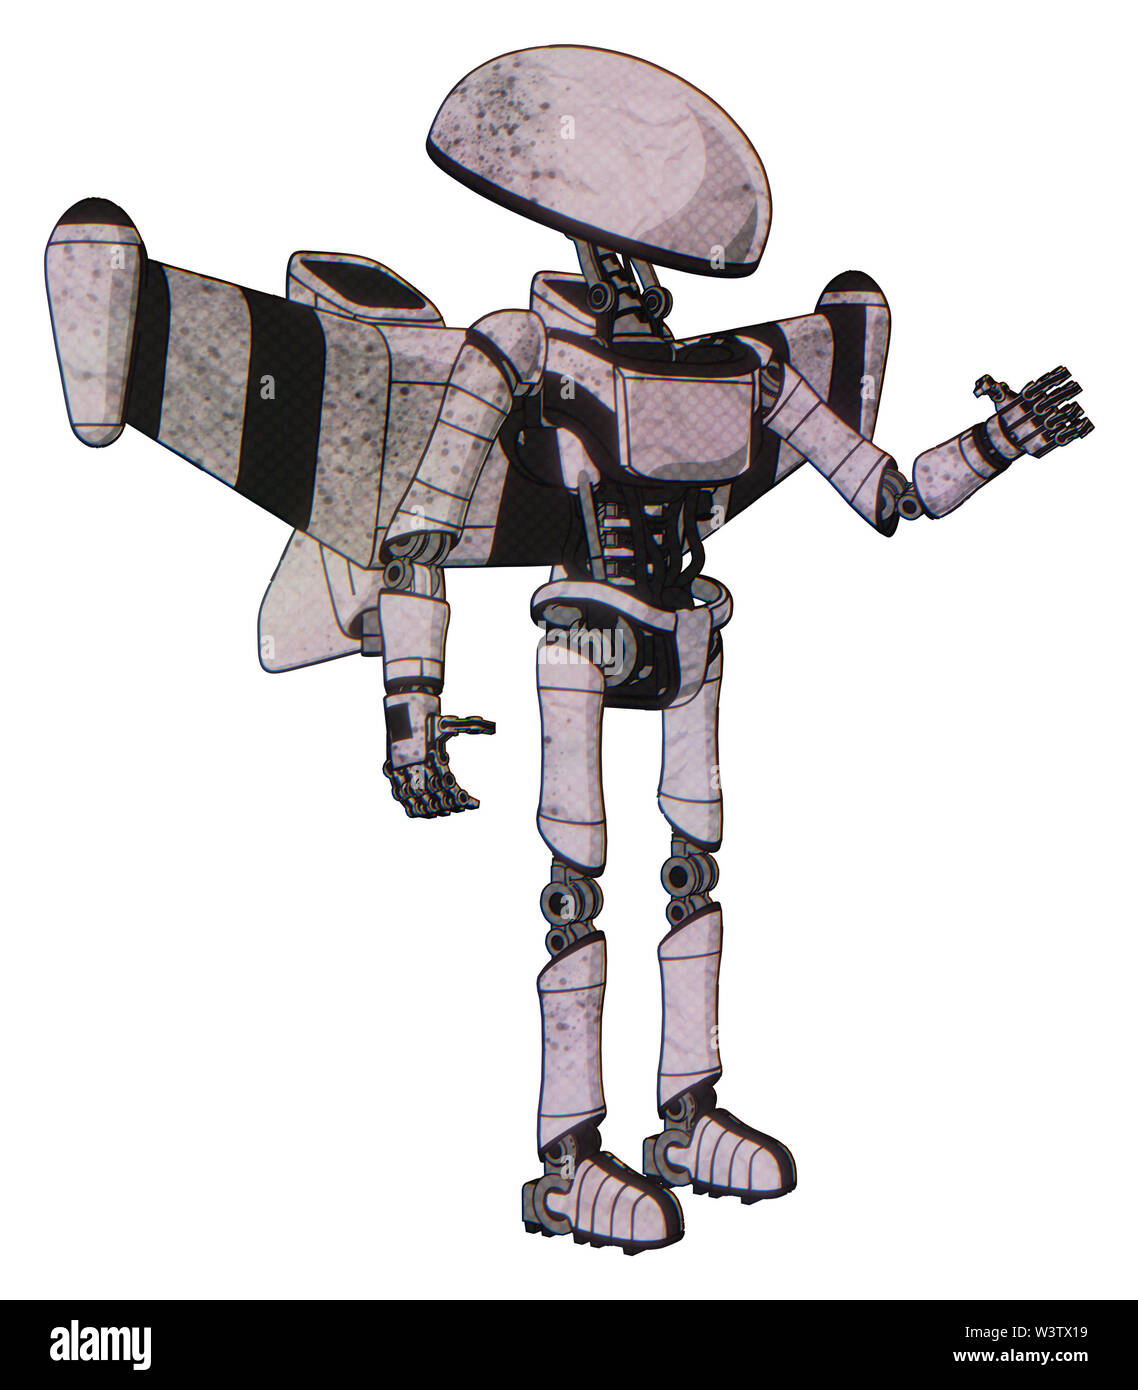 Bot containing elements: dome head, light chest exoshielding, ultralight chest exosuit, stellar jet wing rocket pack, ultralight foot exosuit. Materia - Stock Image